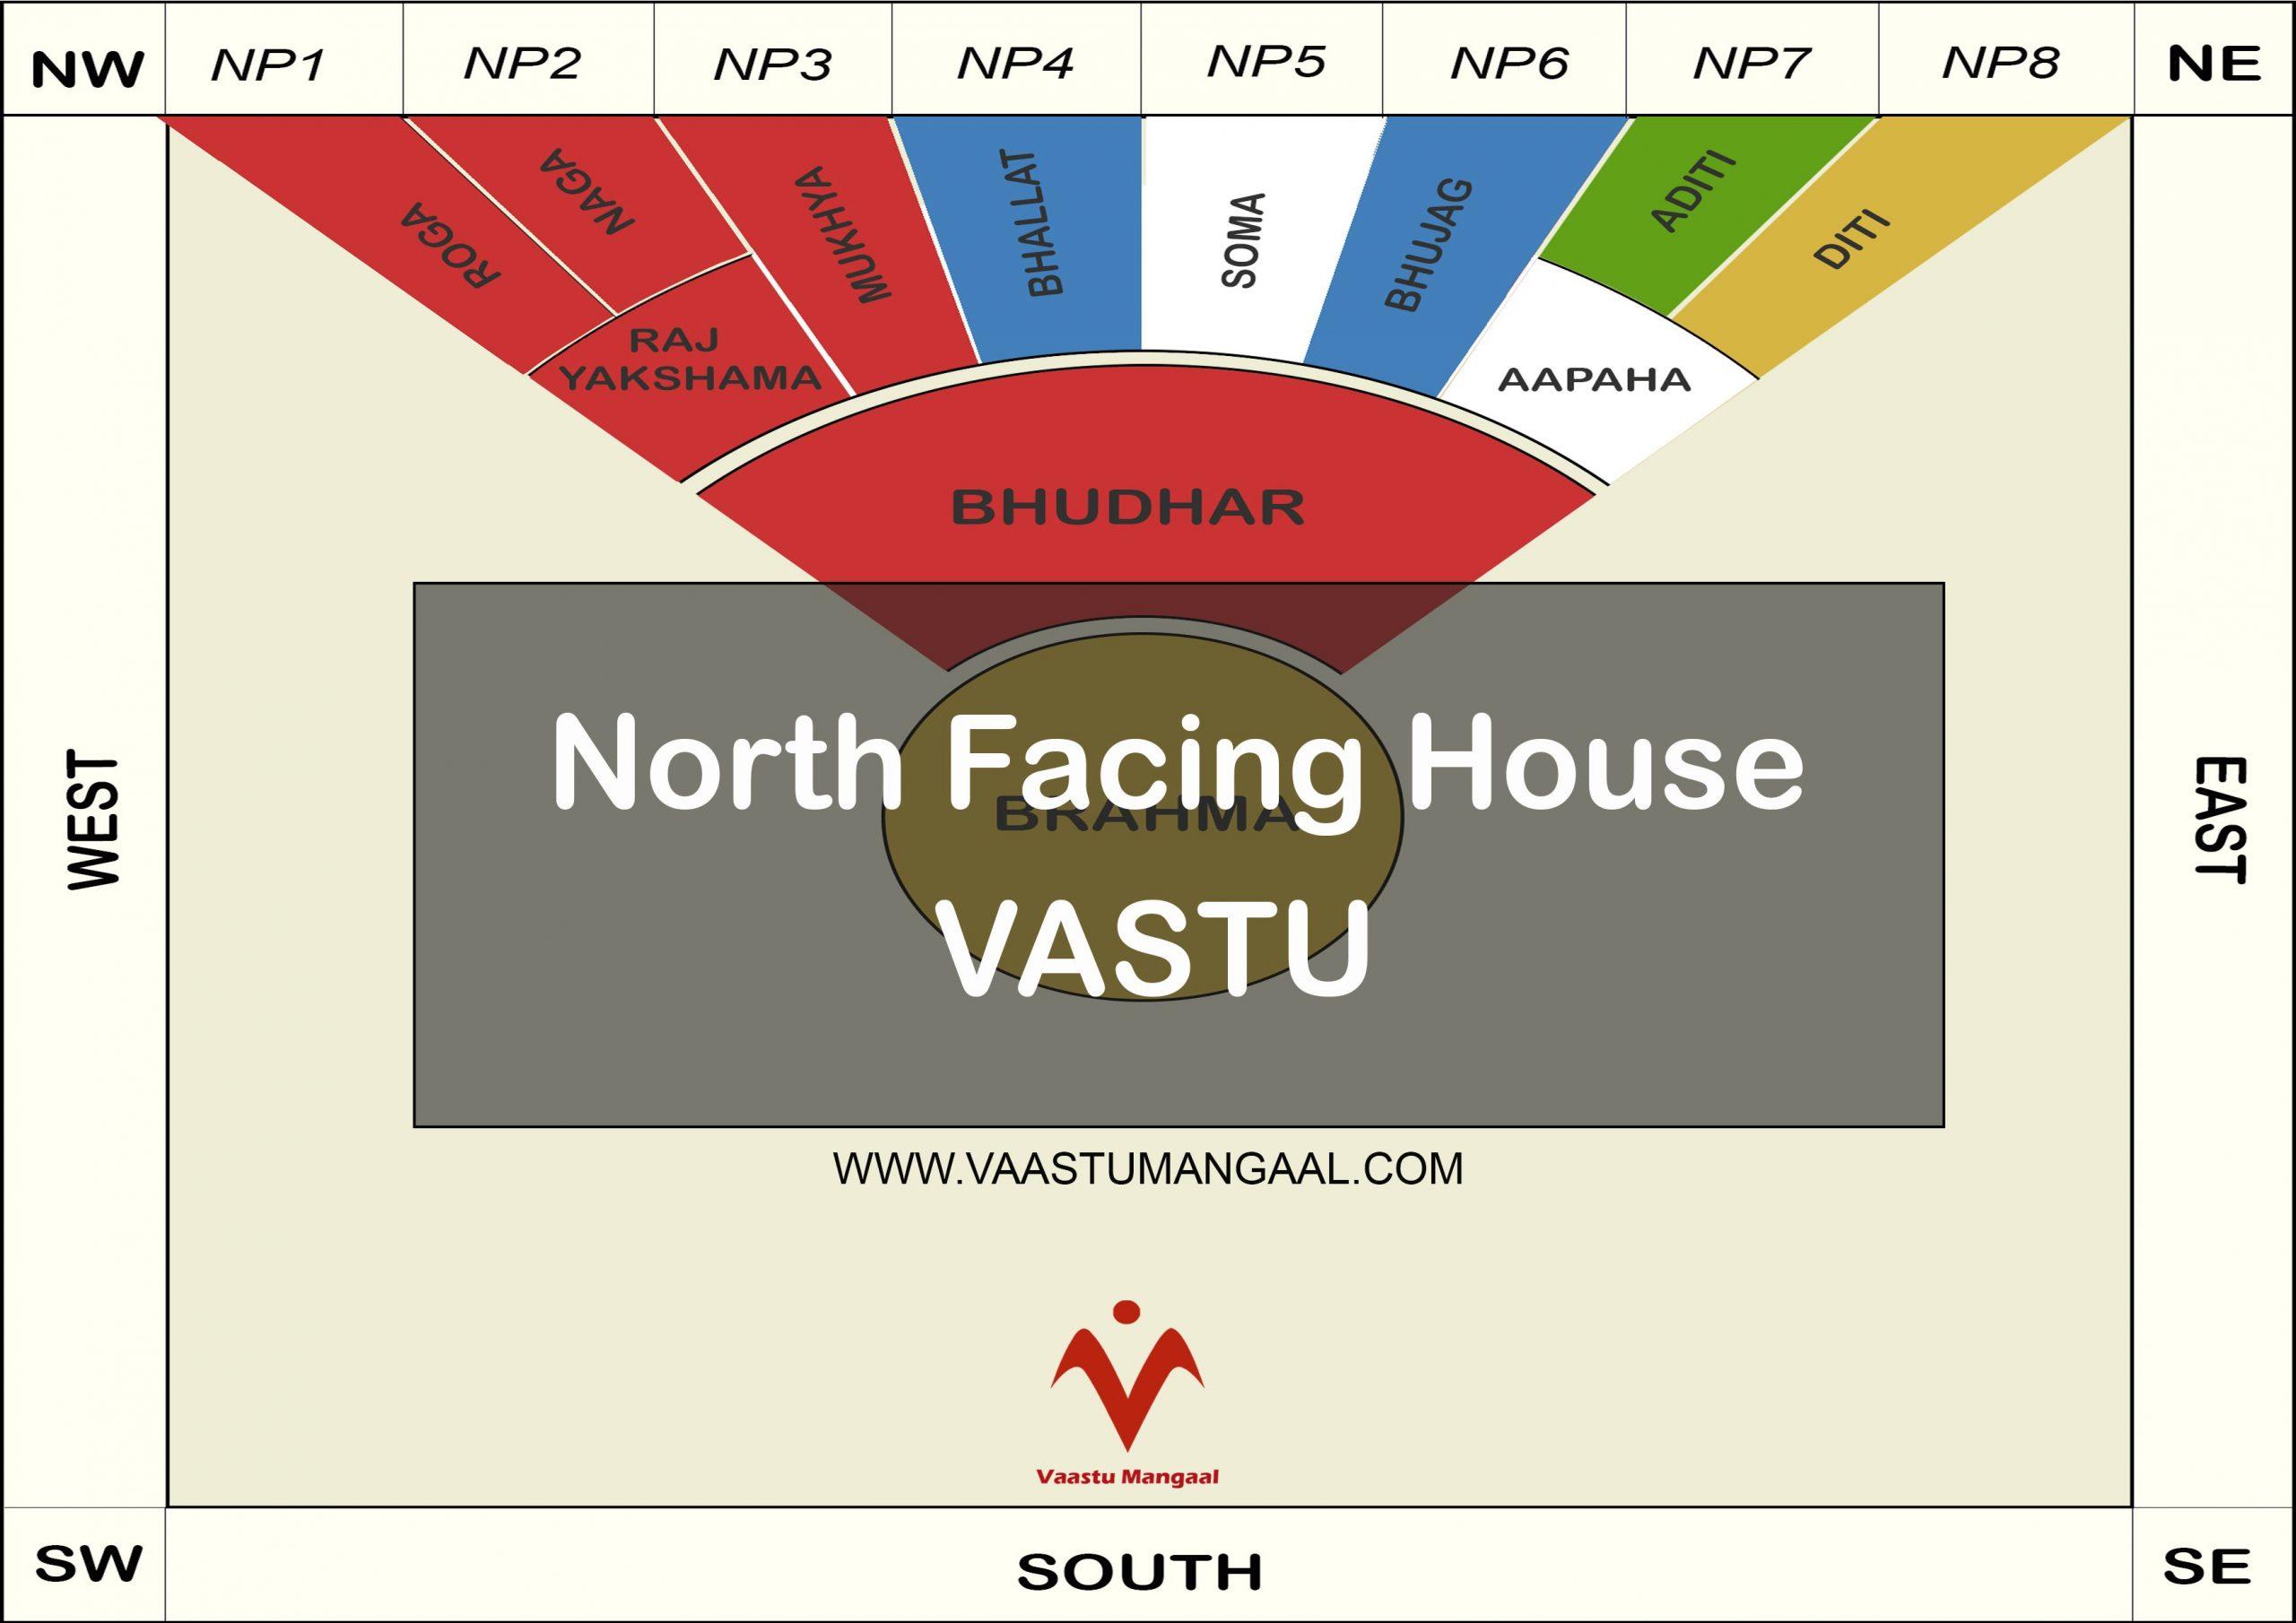 North Facing House Vastu Its Significance In Helping You Gain Wealth Vaastu Mangaal